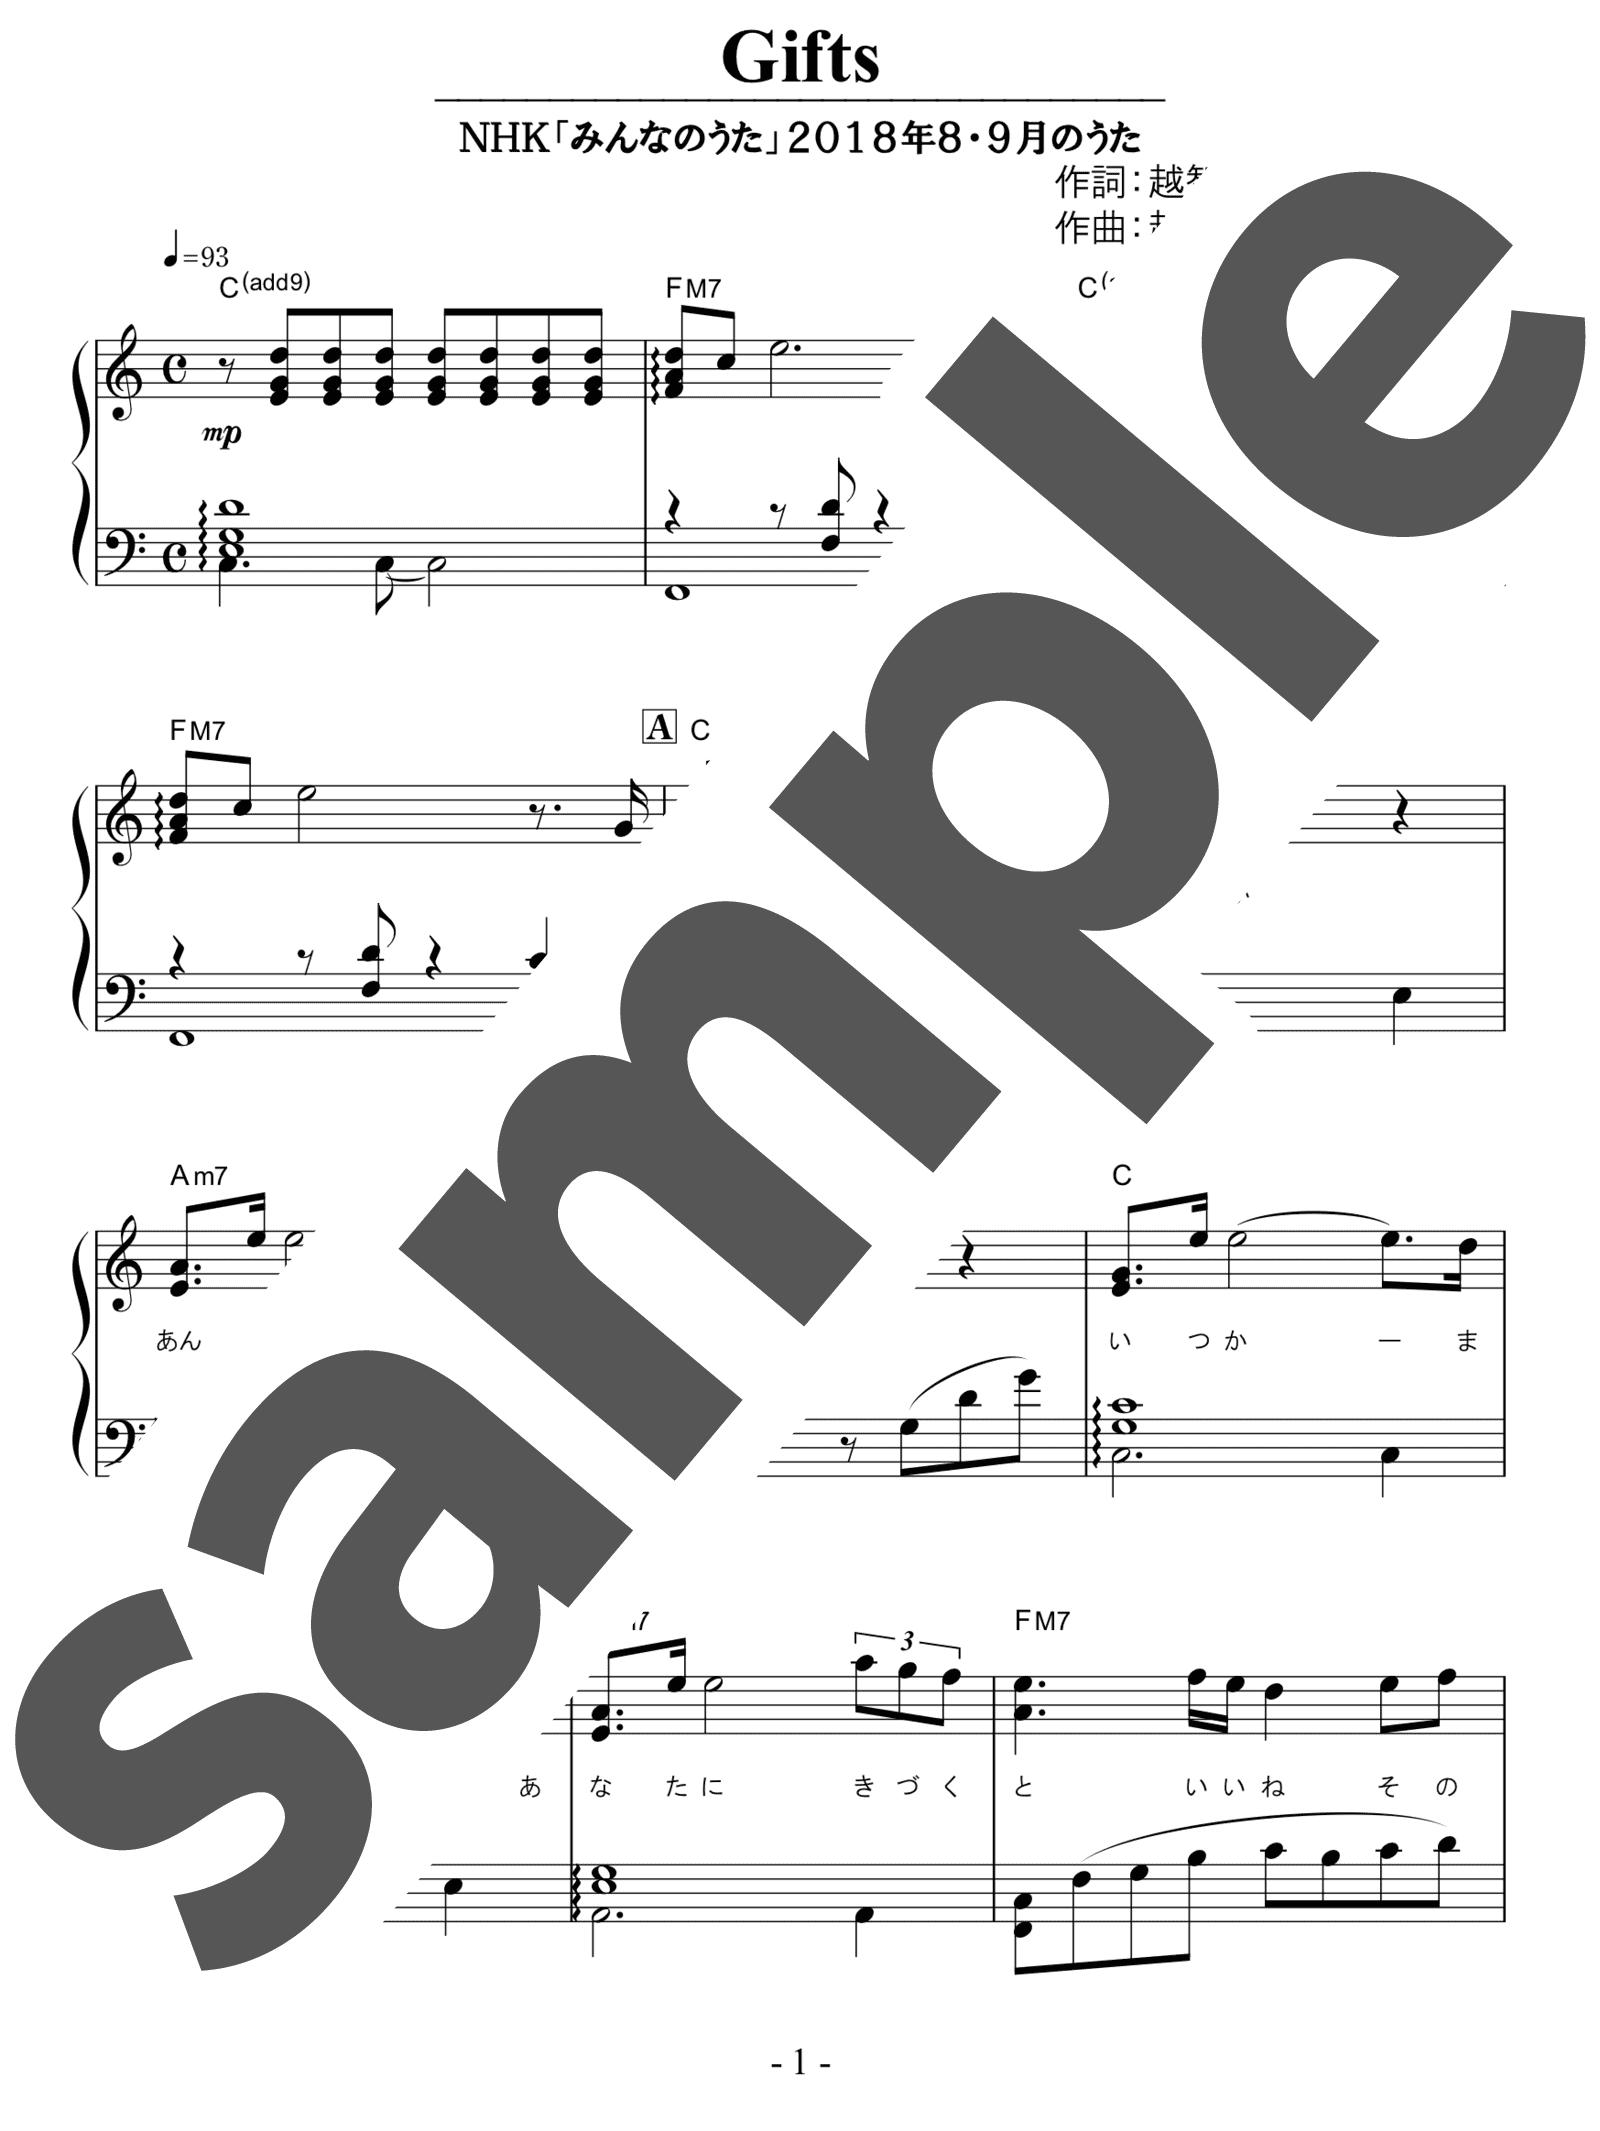 「Gifts」のサンプル楽譜